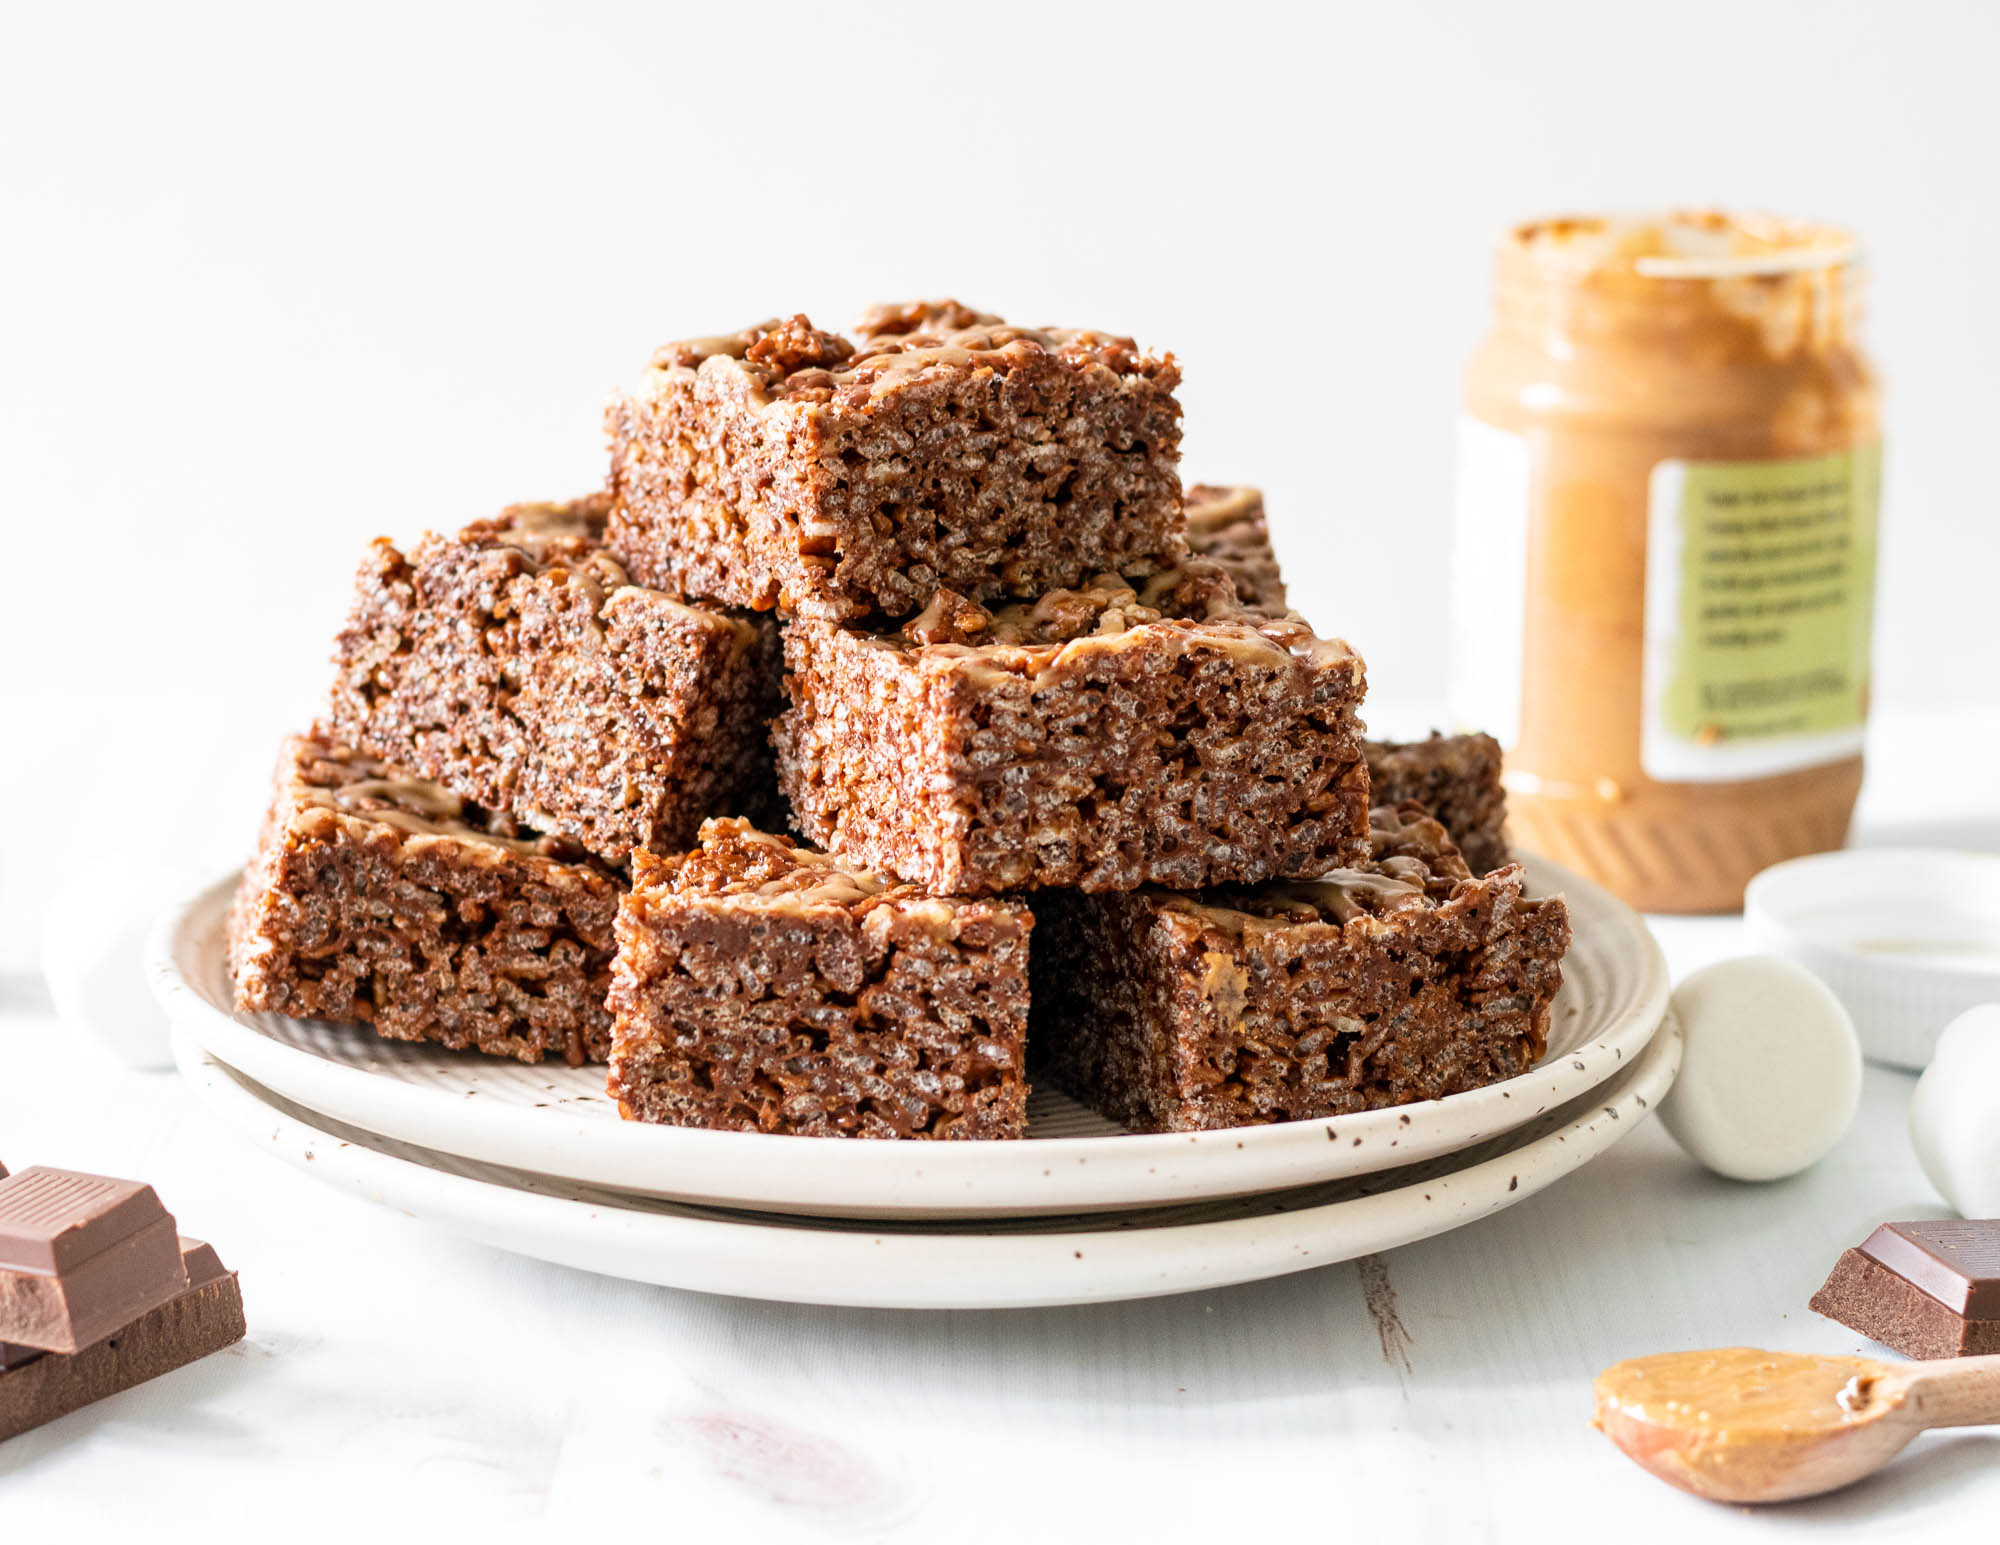 Peanut-Butter-Chocolate-Rice-Krispie-Treats-6.jpg